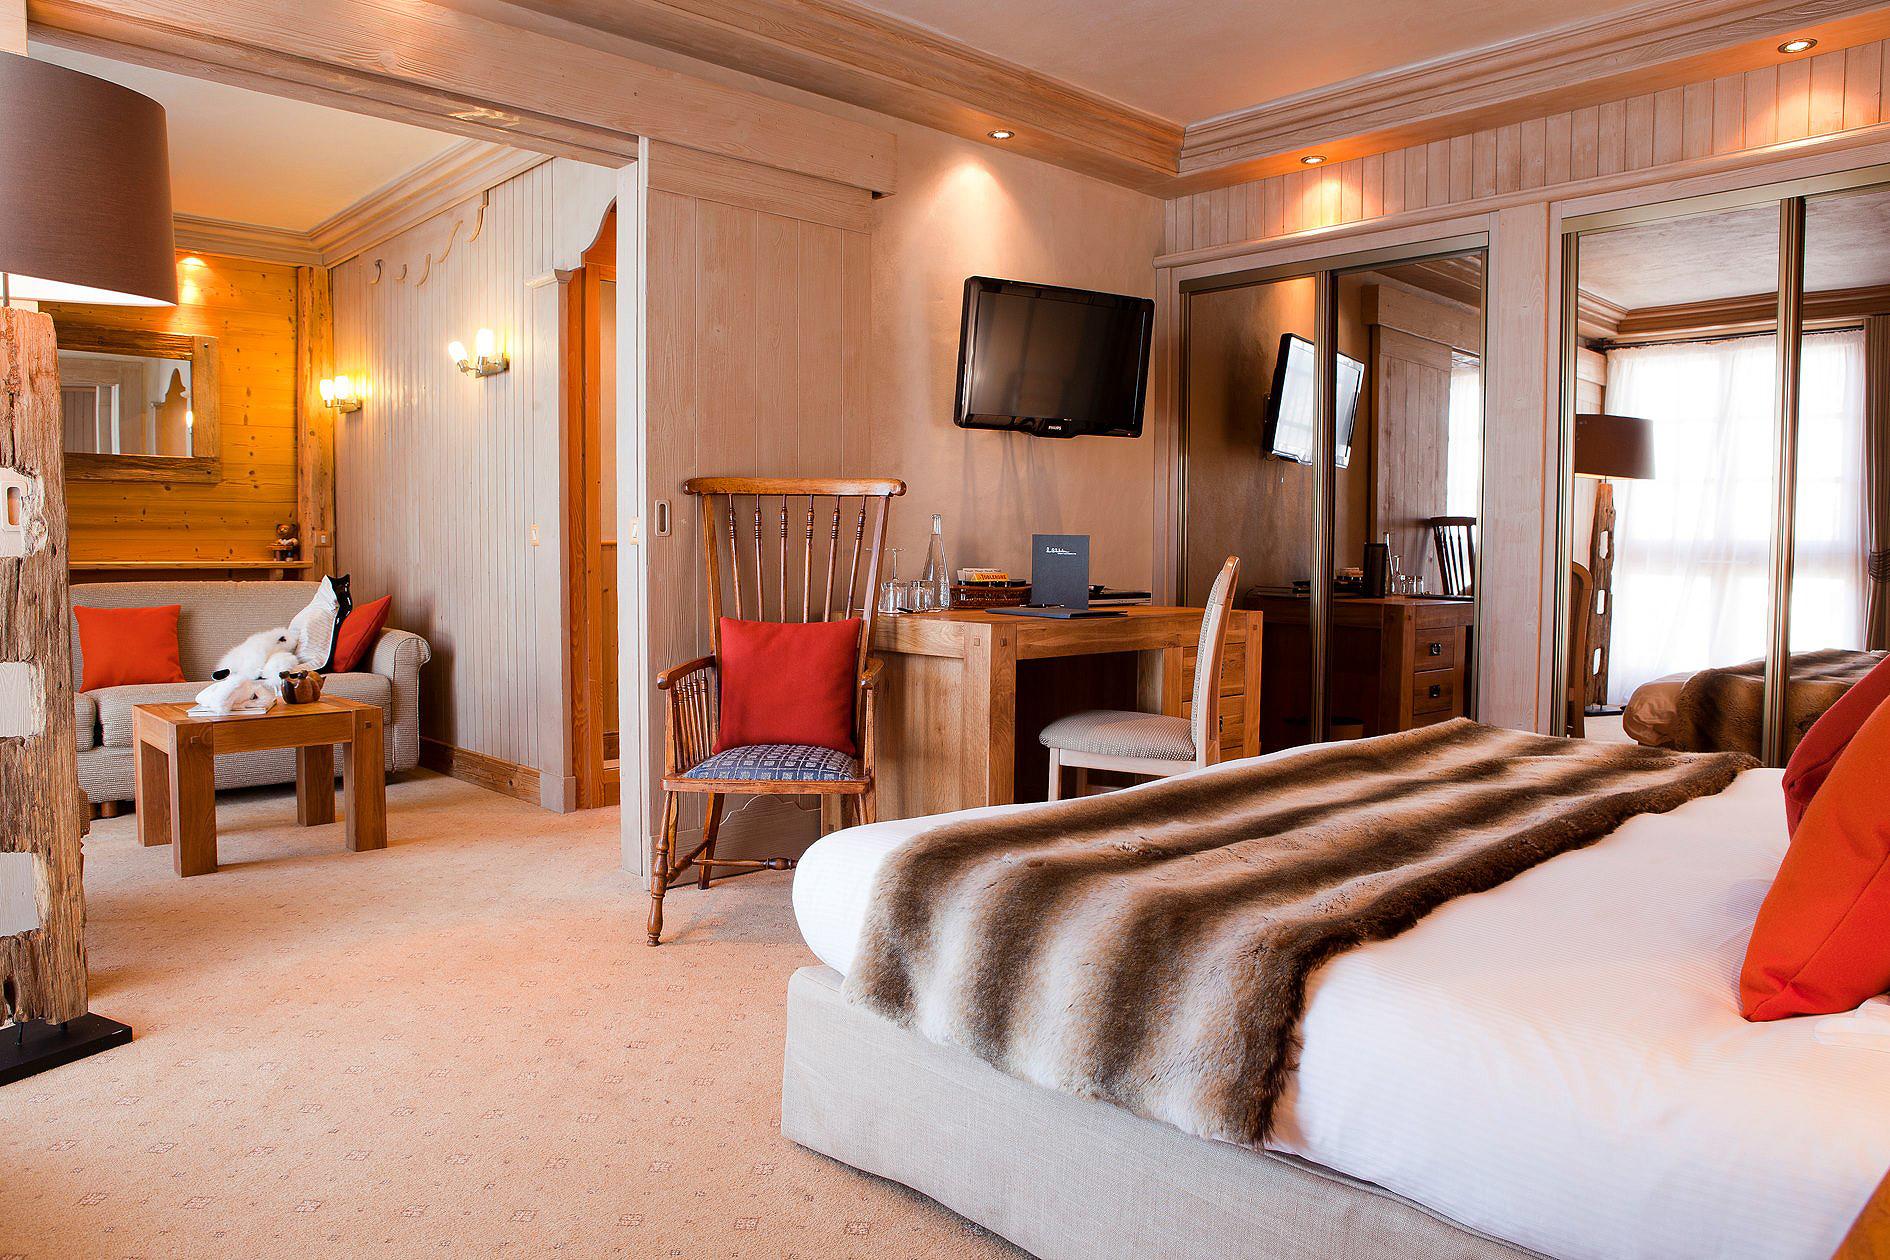 Five-star mountain resort luxury at Le Chabichou Hôtel, Courchevel, France 11